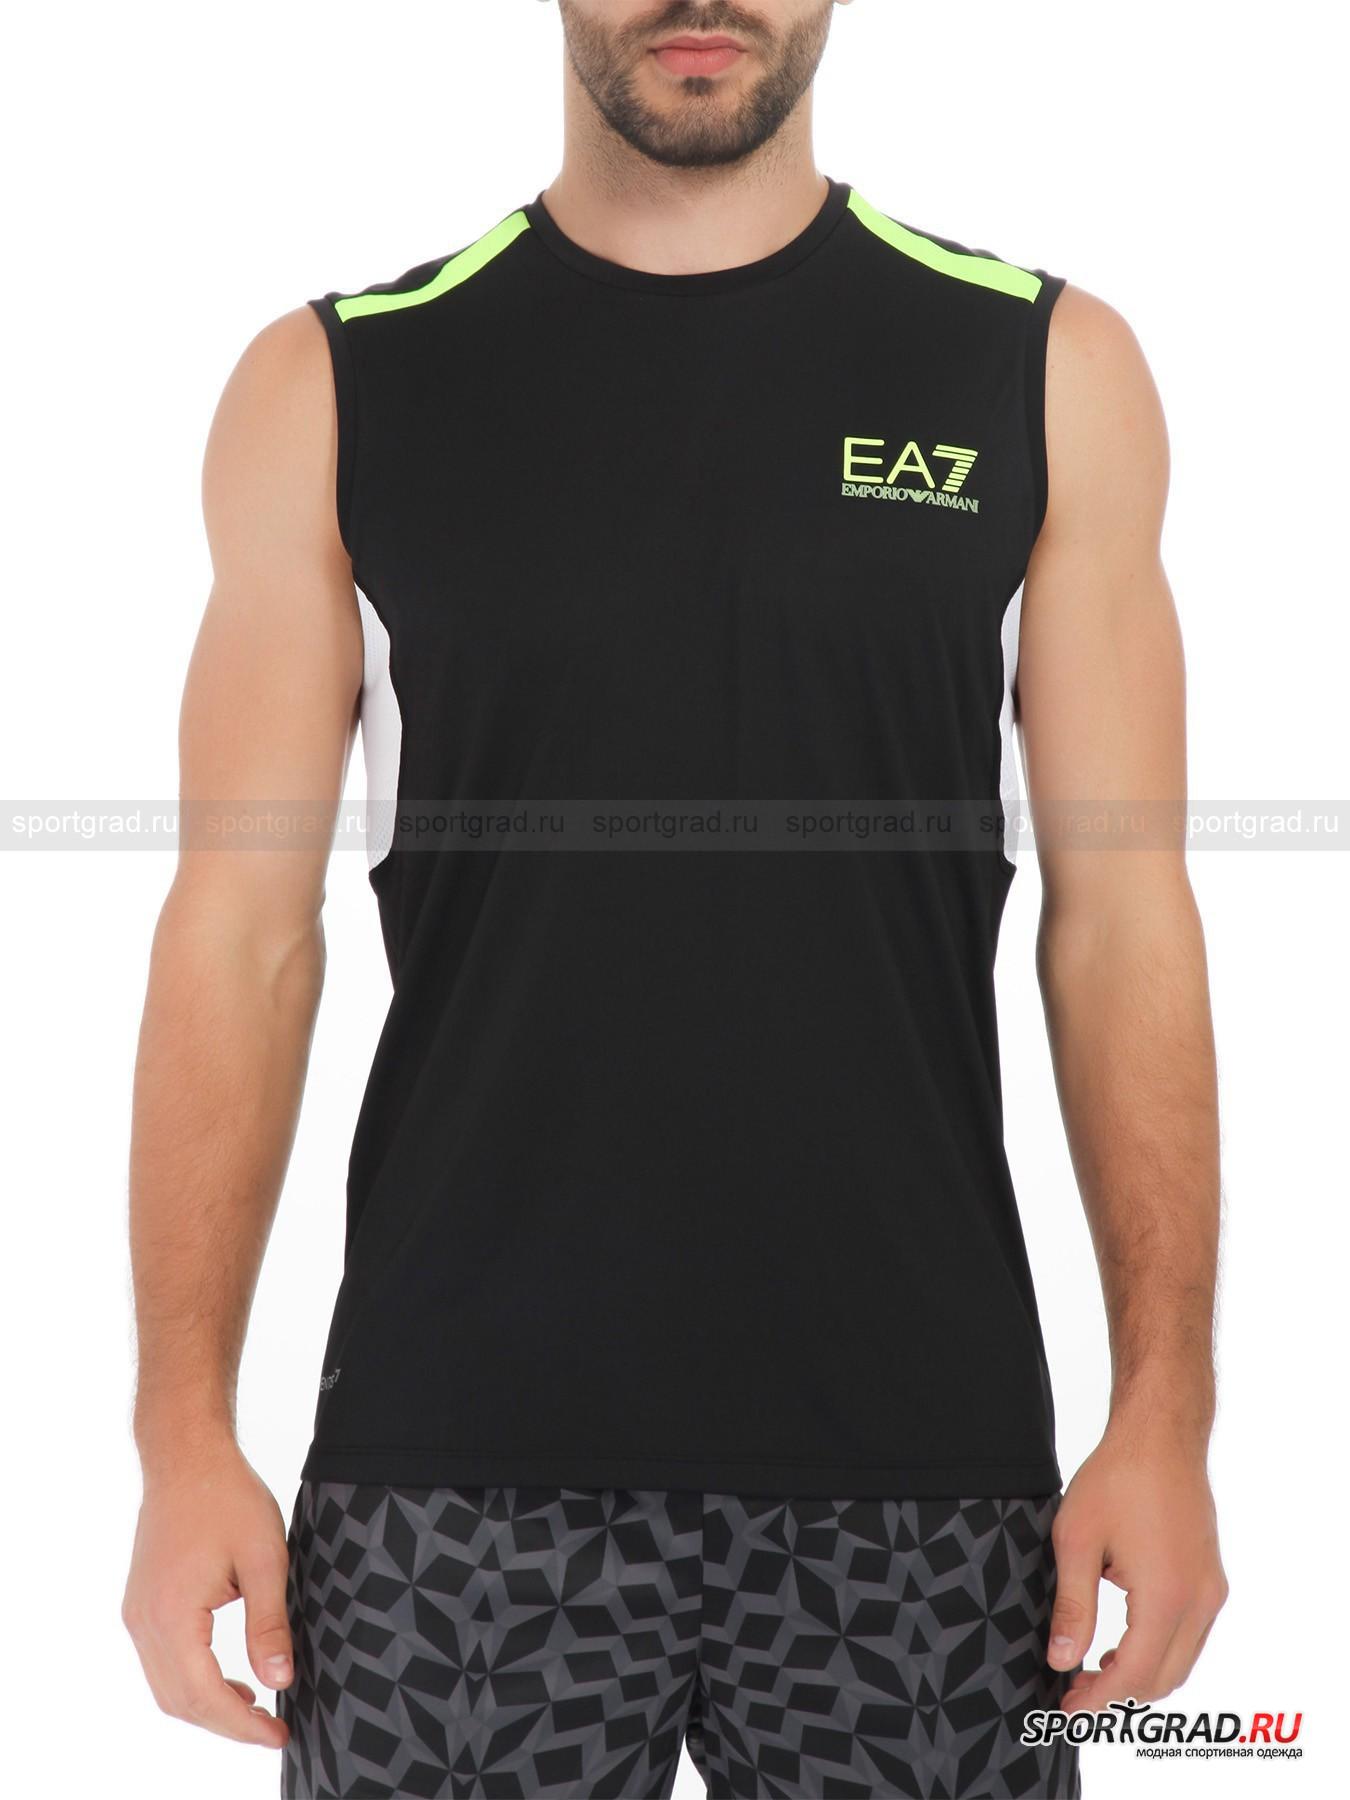 ����� ������� ��� ������ Ventus7 Sleeveless T-shirt EA7 Emporio Armani